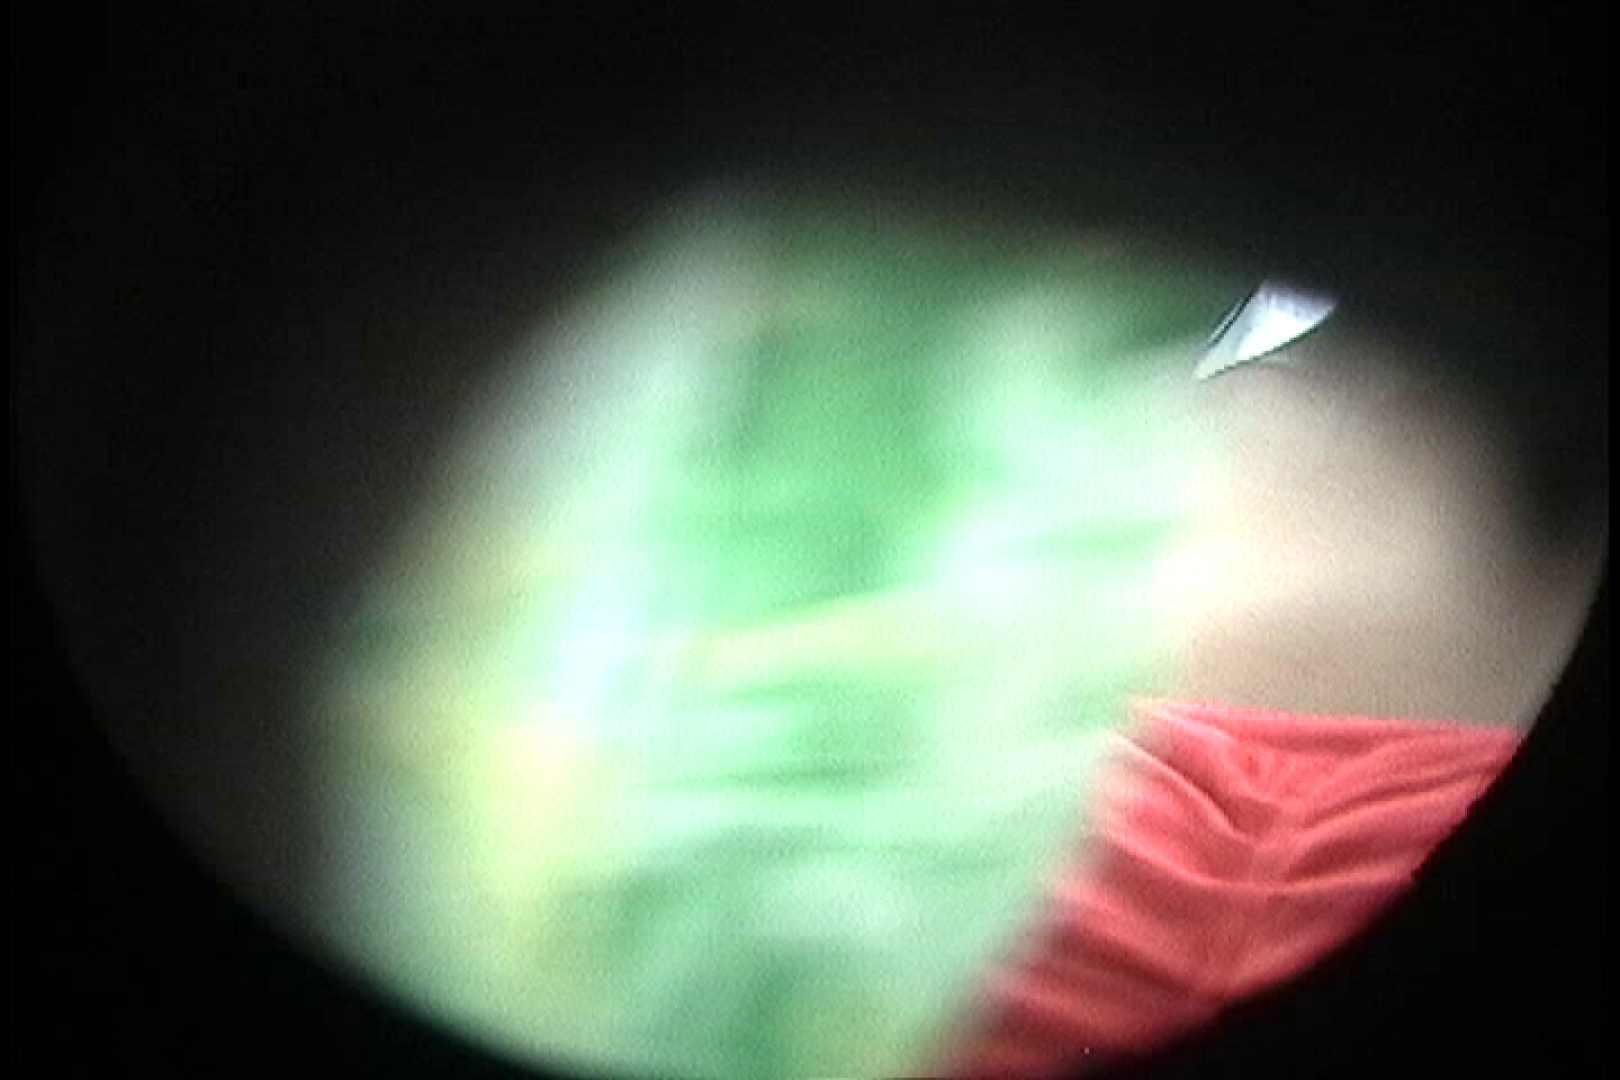 No.22 日焼け跡とオッパイの関係がおかしな貧乳ギャル ギャルハメ撮り  40Pix 4